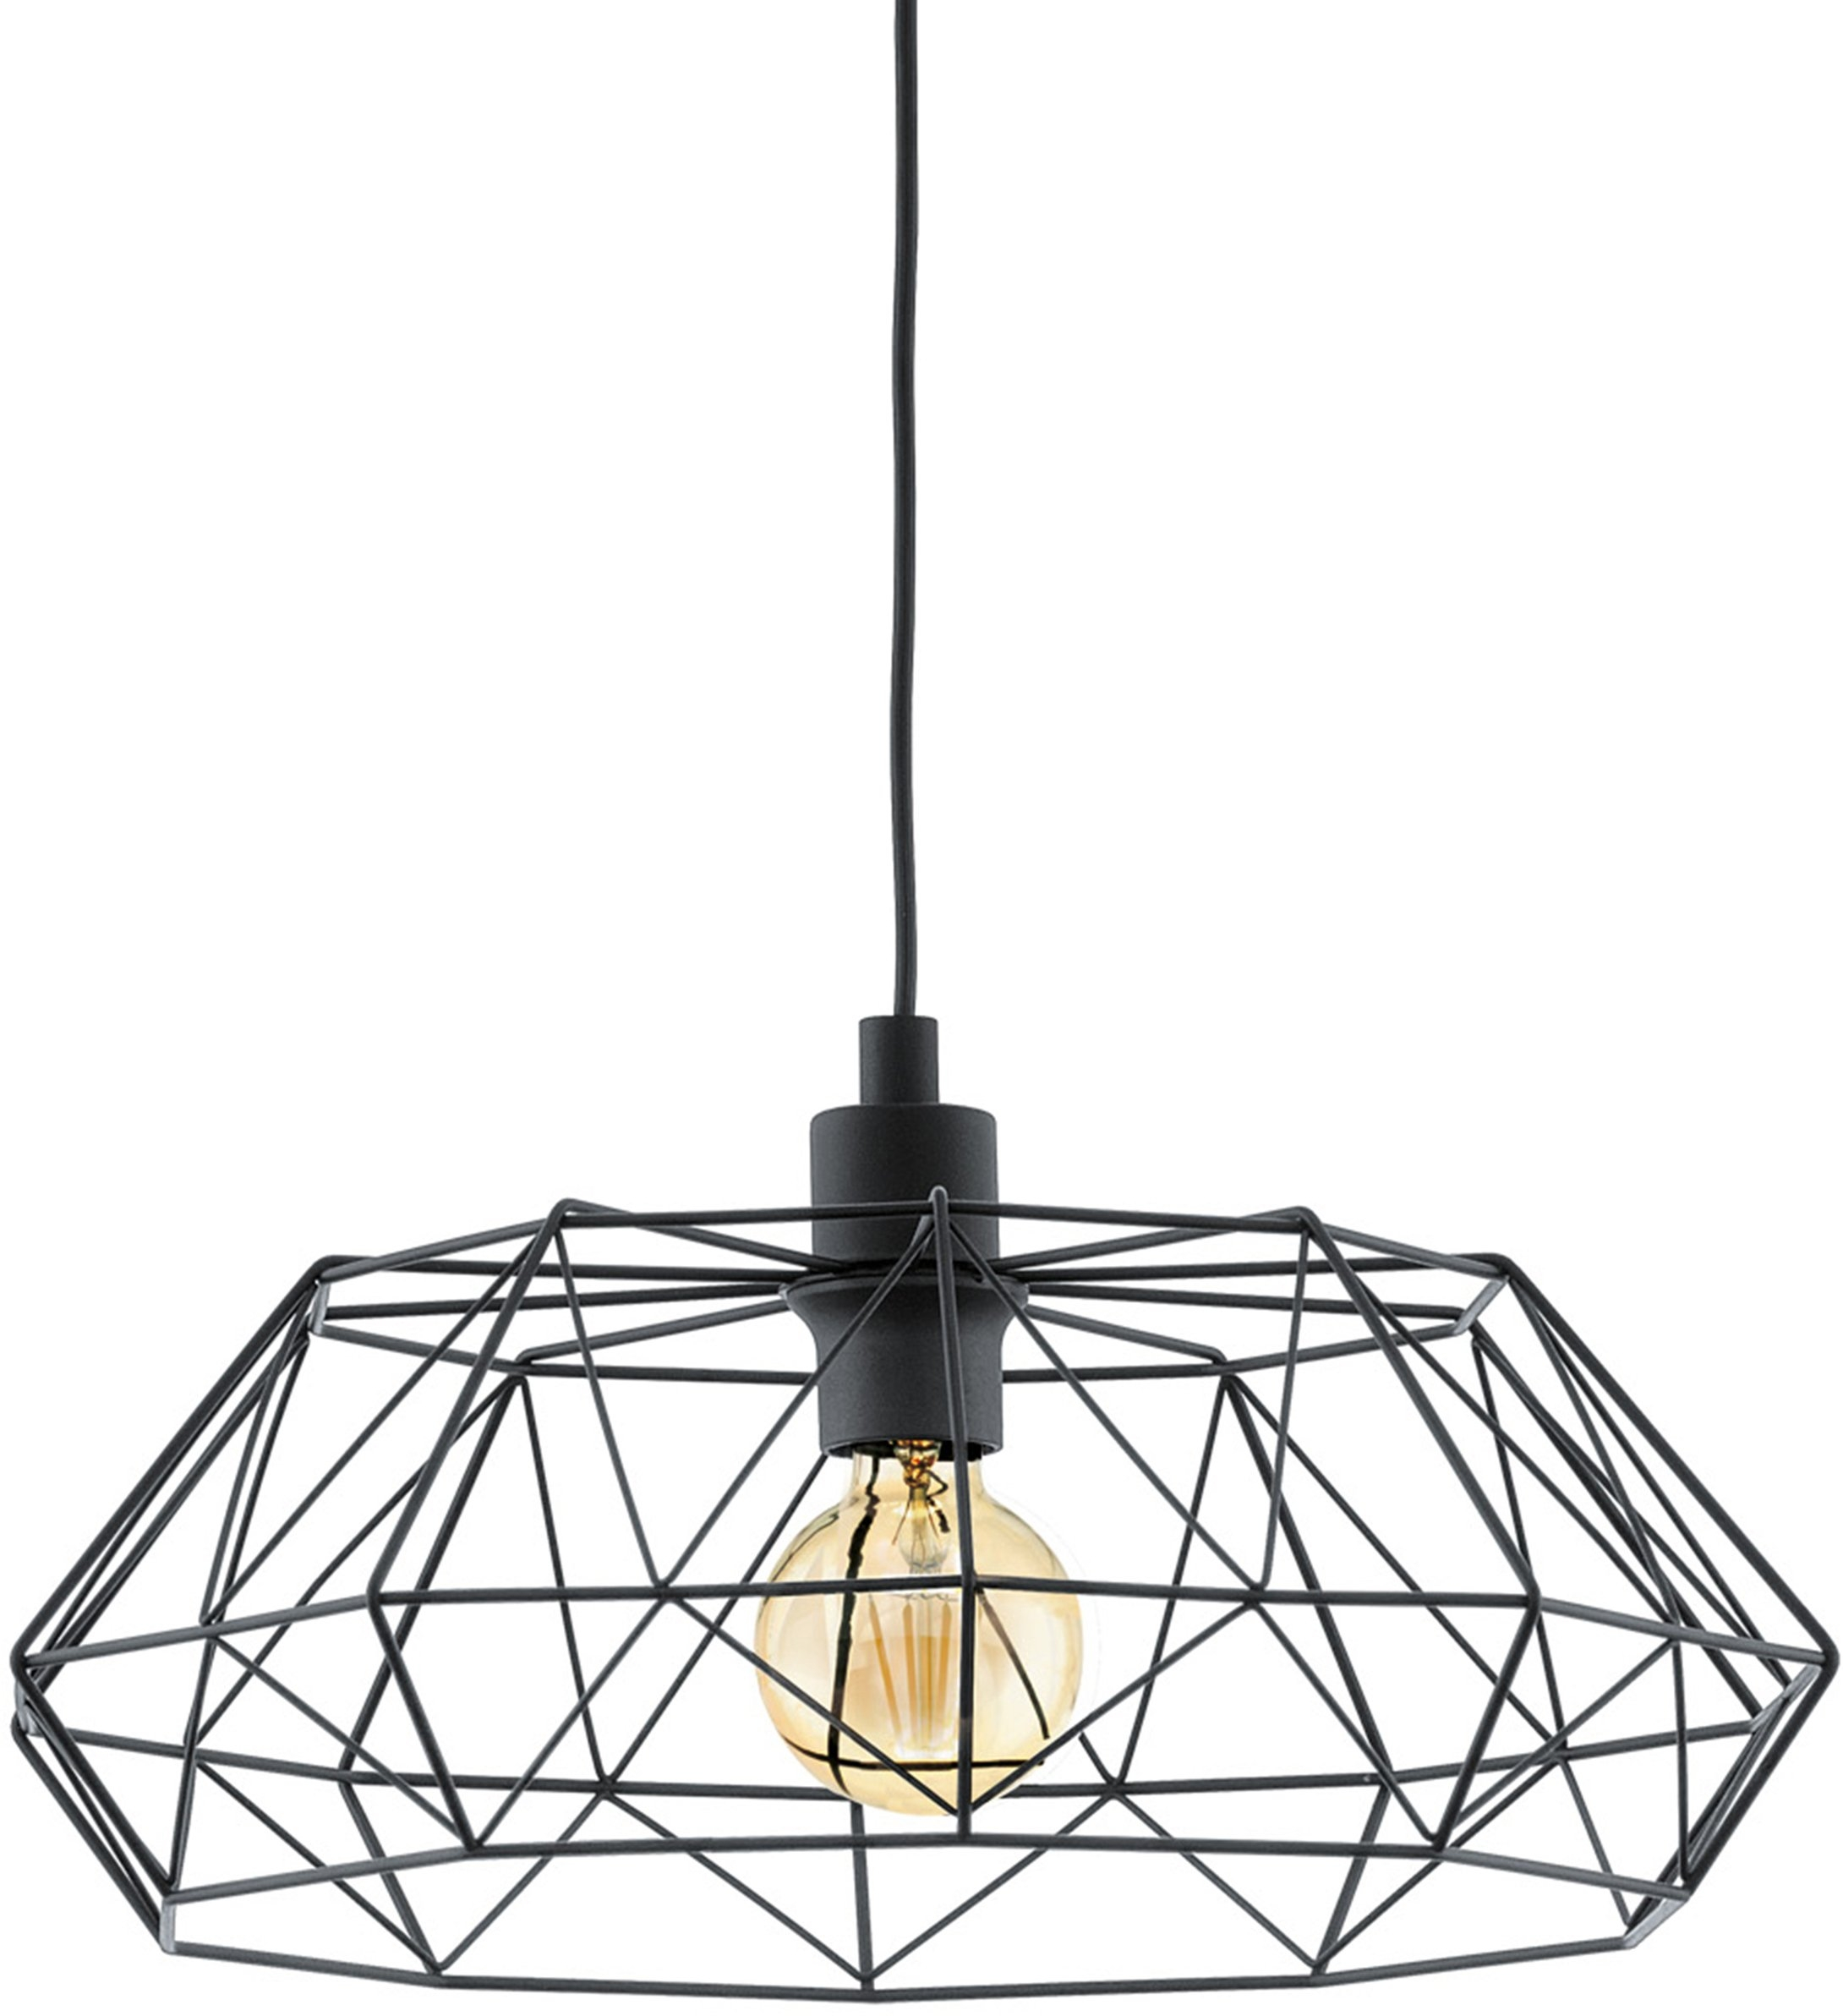 EGLO hanglamp »CARLTON 2«, bij OTTO online kopen